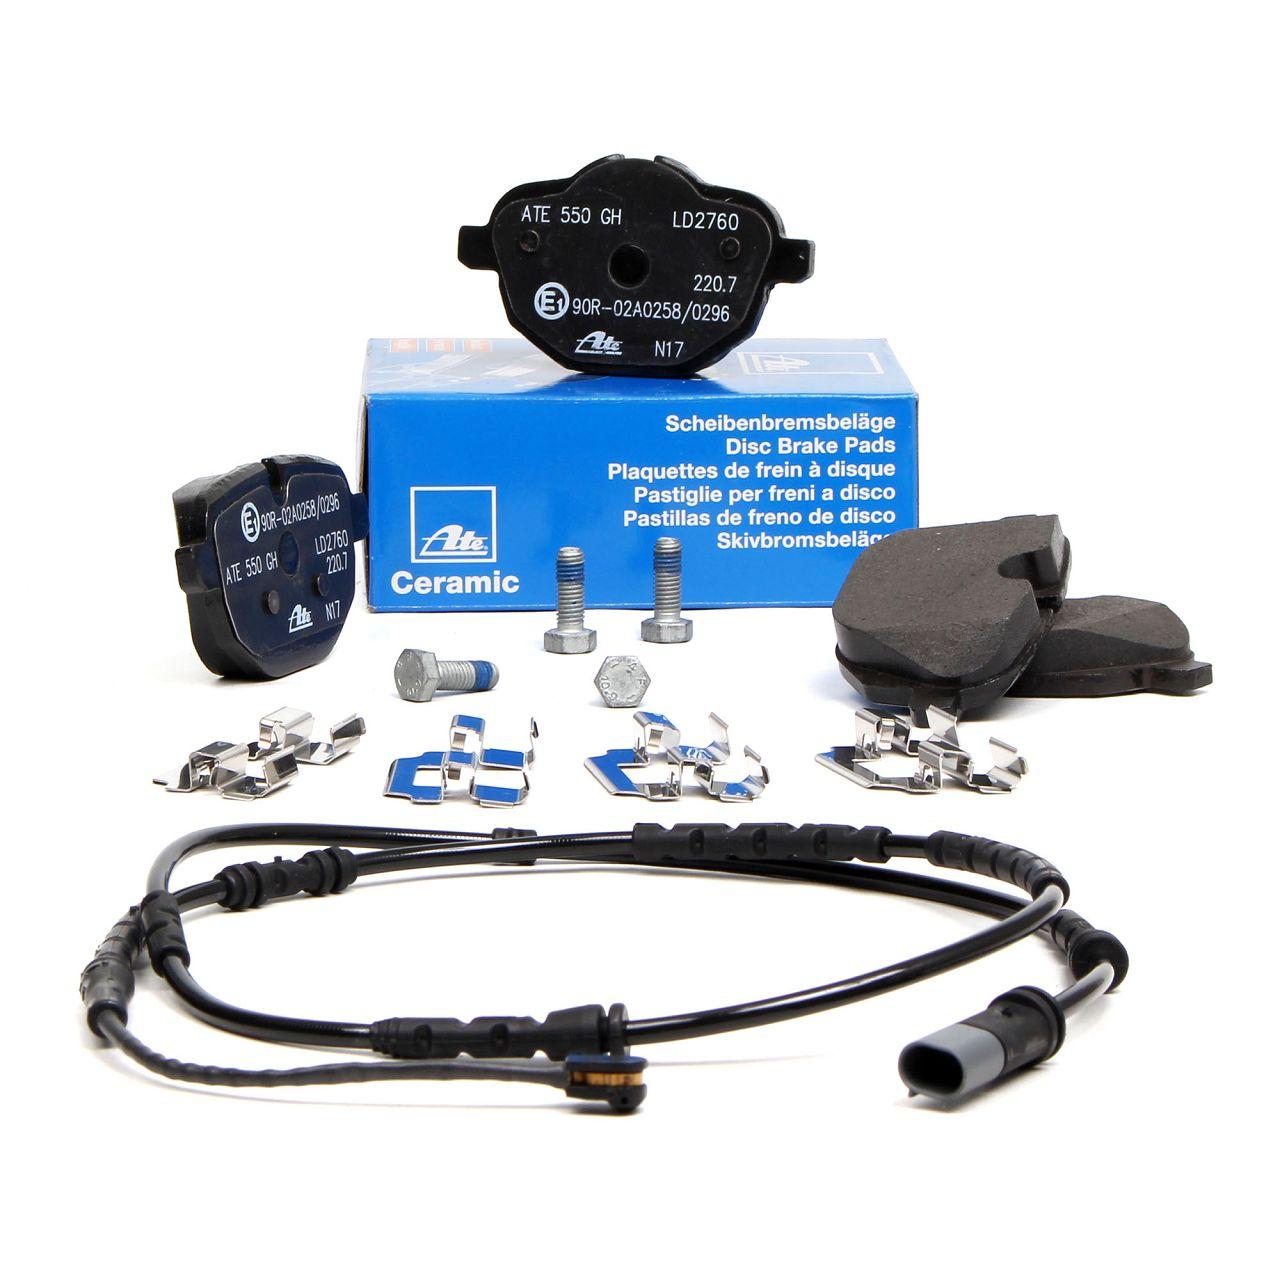 ATE CERAMIC Bremsbeläge + Warnkontakt für BMW X3 F25 X4 F26 20-35i 18-35d hinten